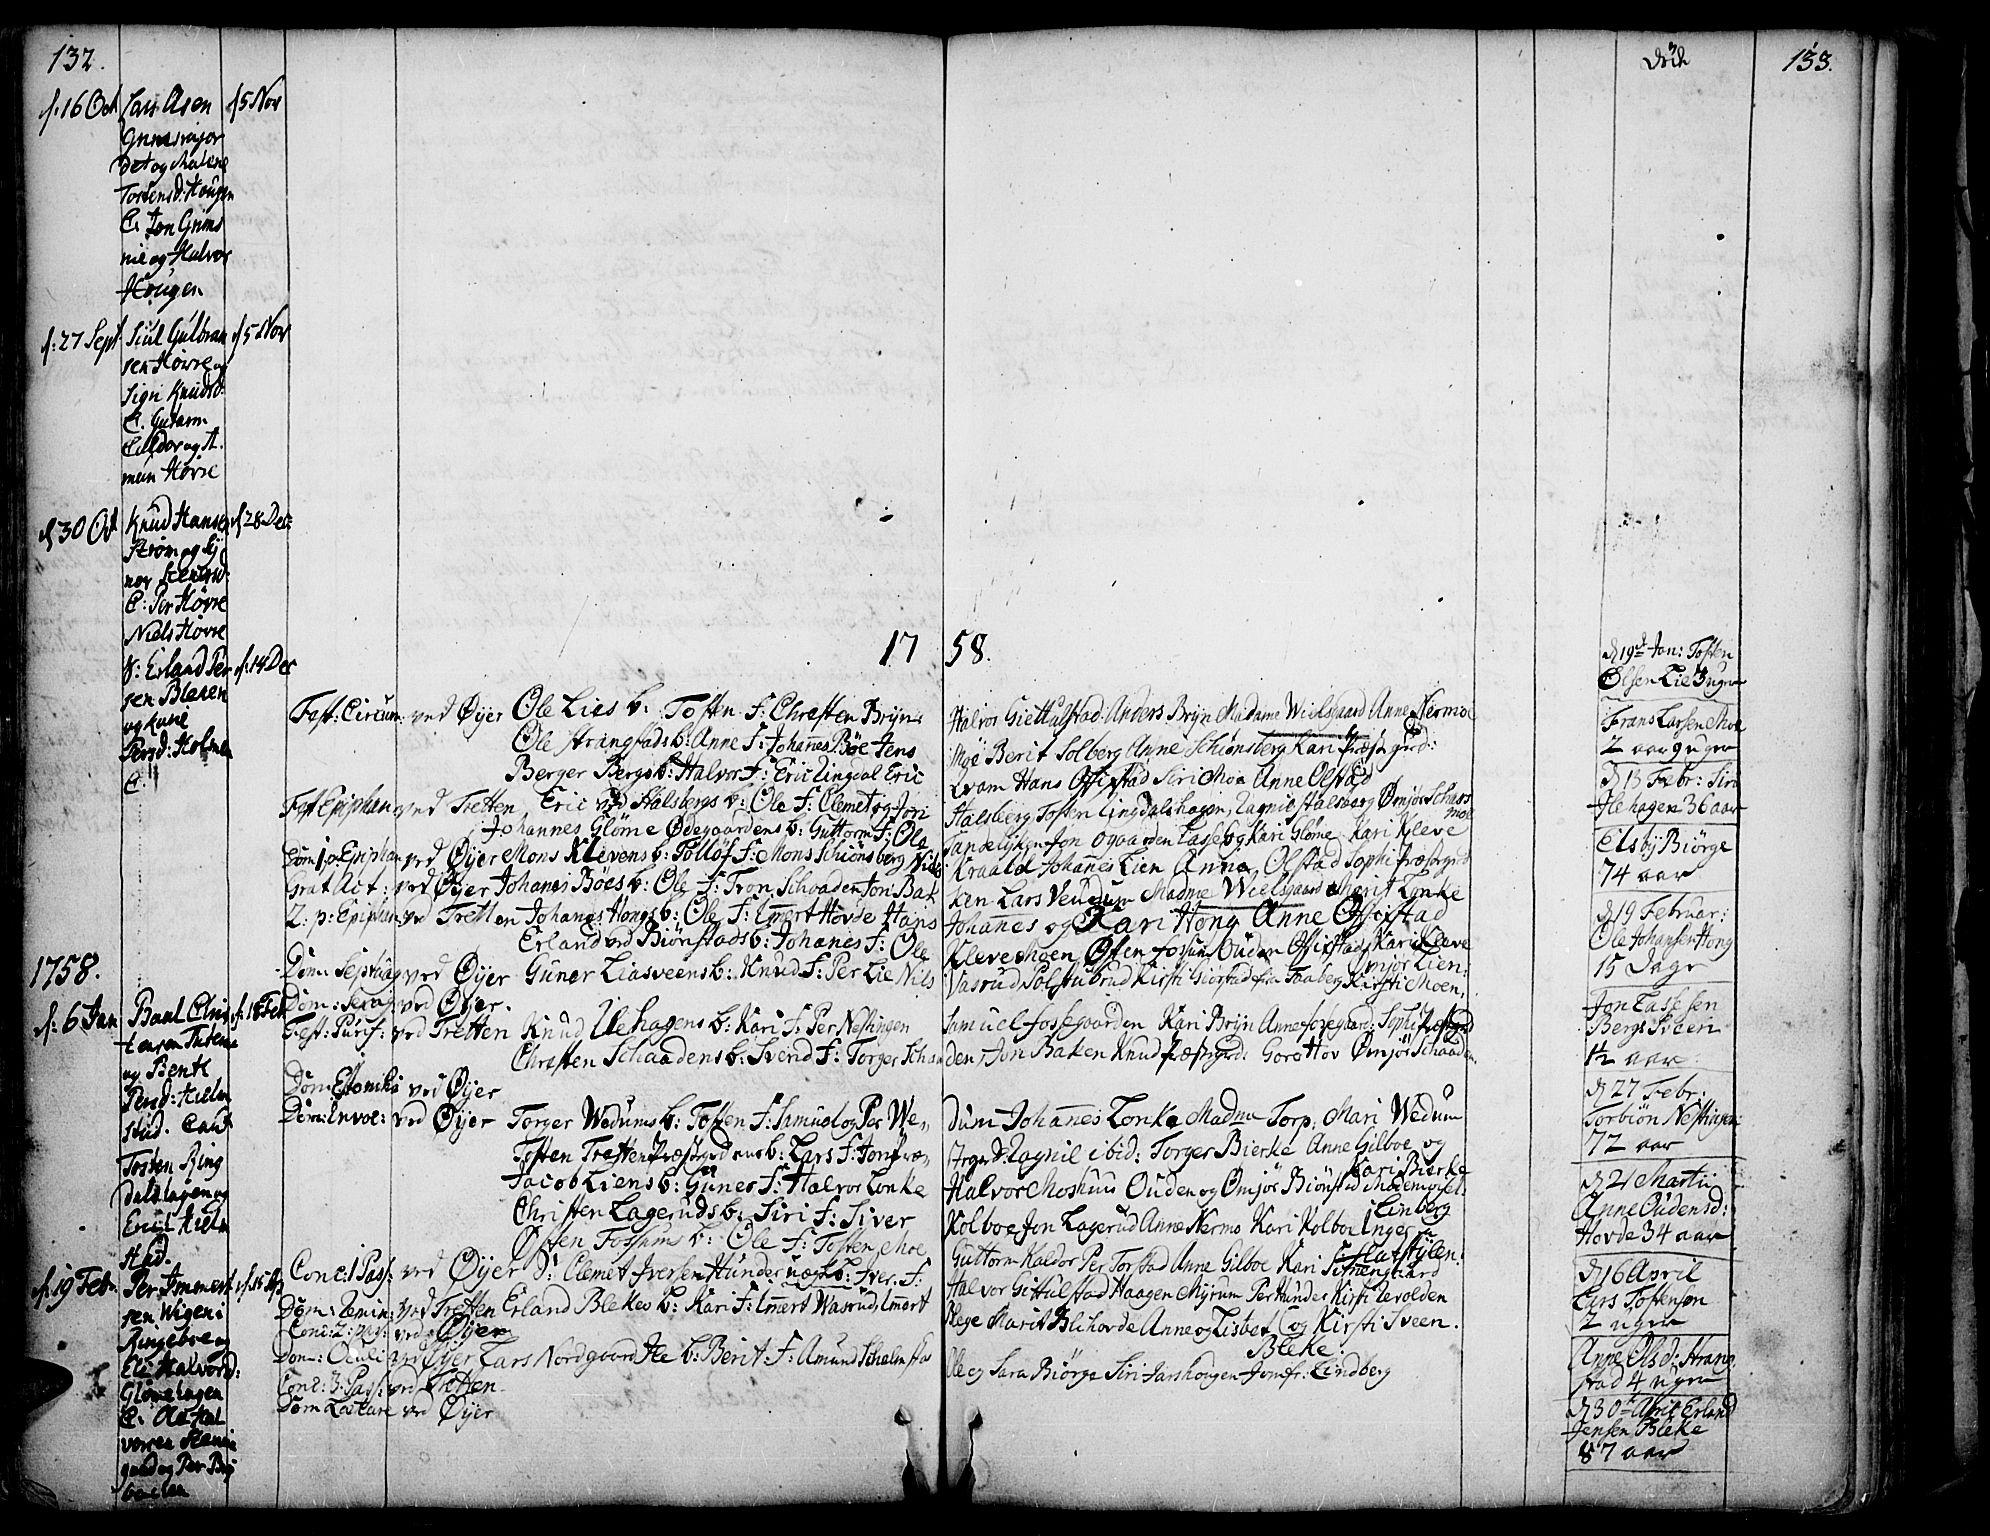 SAH, Øyer prestekontor, Ministerialbok nr. 2, 1733-1784, s. 132-133